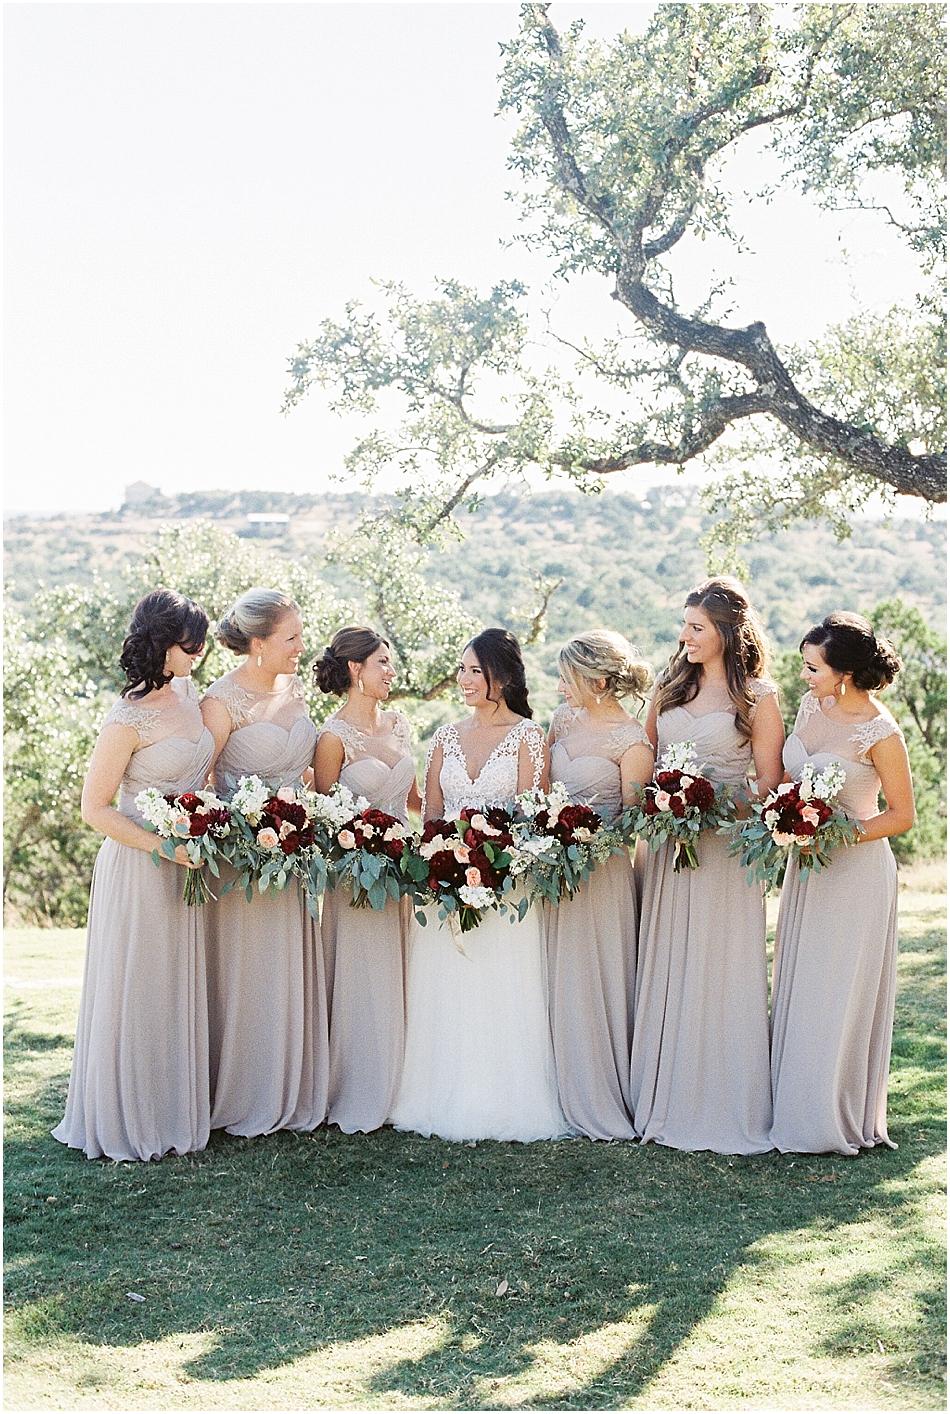 Adrianna + Preston   Film   Wedding   Canyonwood Ridge   Texas Hill Country   Emilie Anne Photography-59.jpg